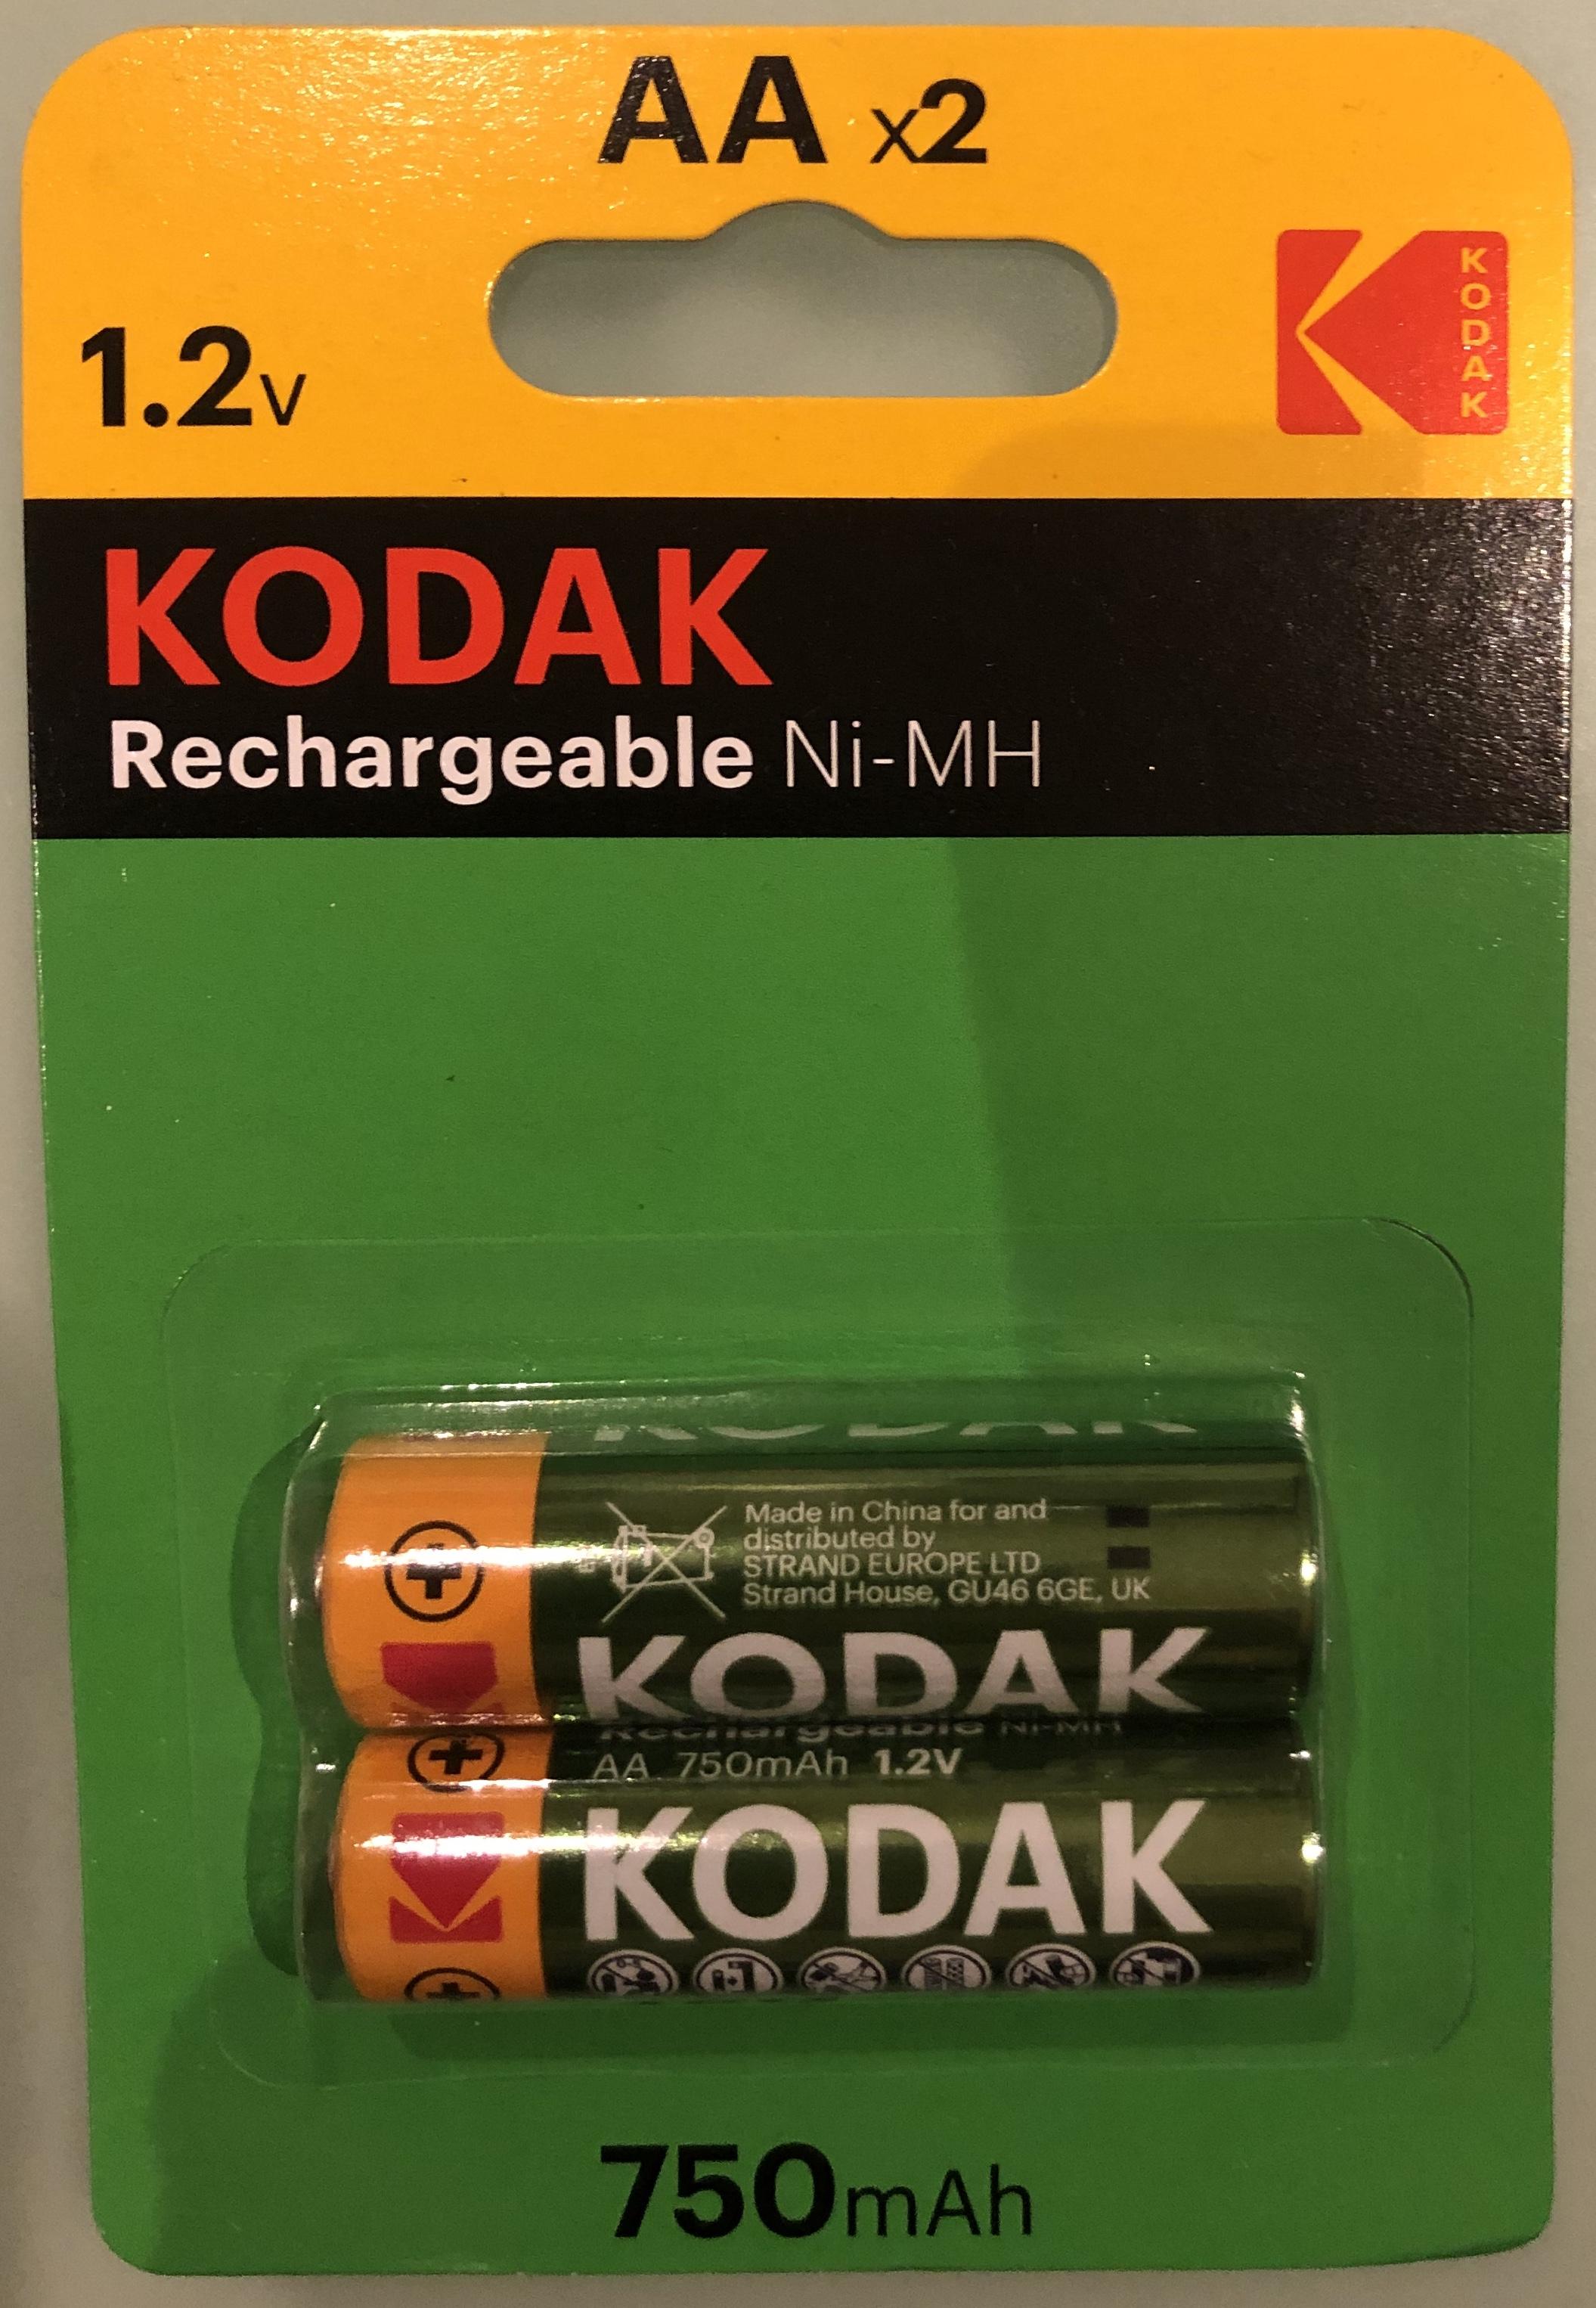 Kodak Rechargeable AA Batteries £1 @ Poundland Bracknell